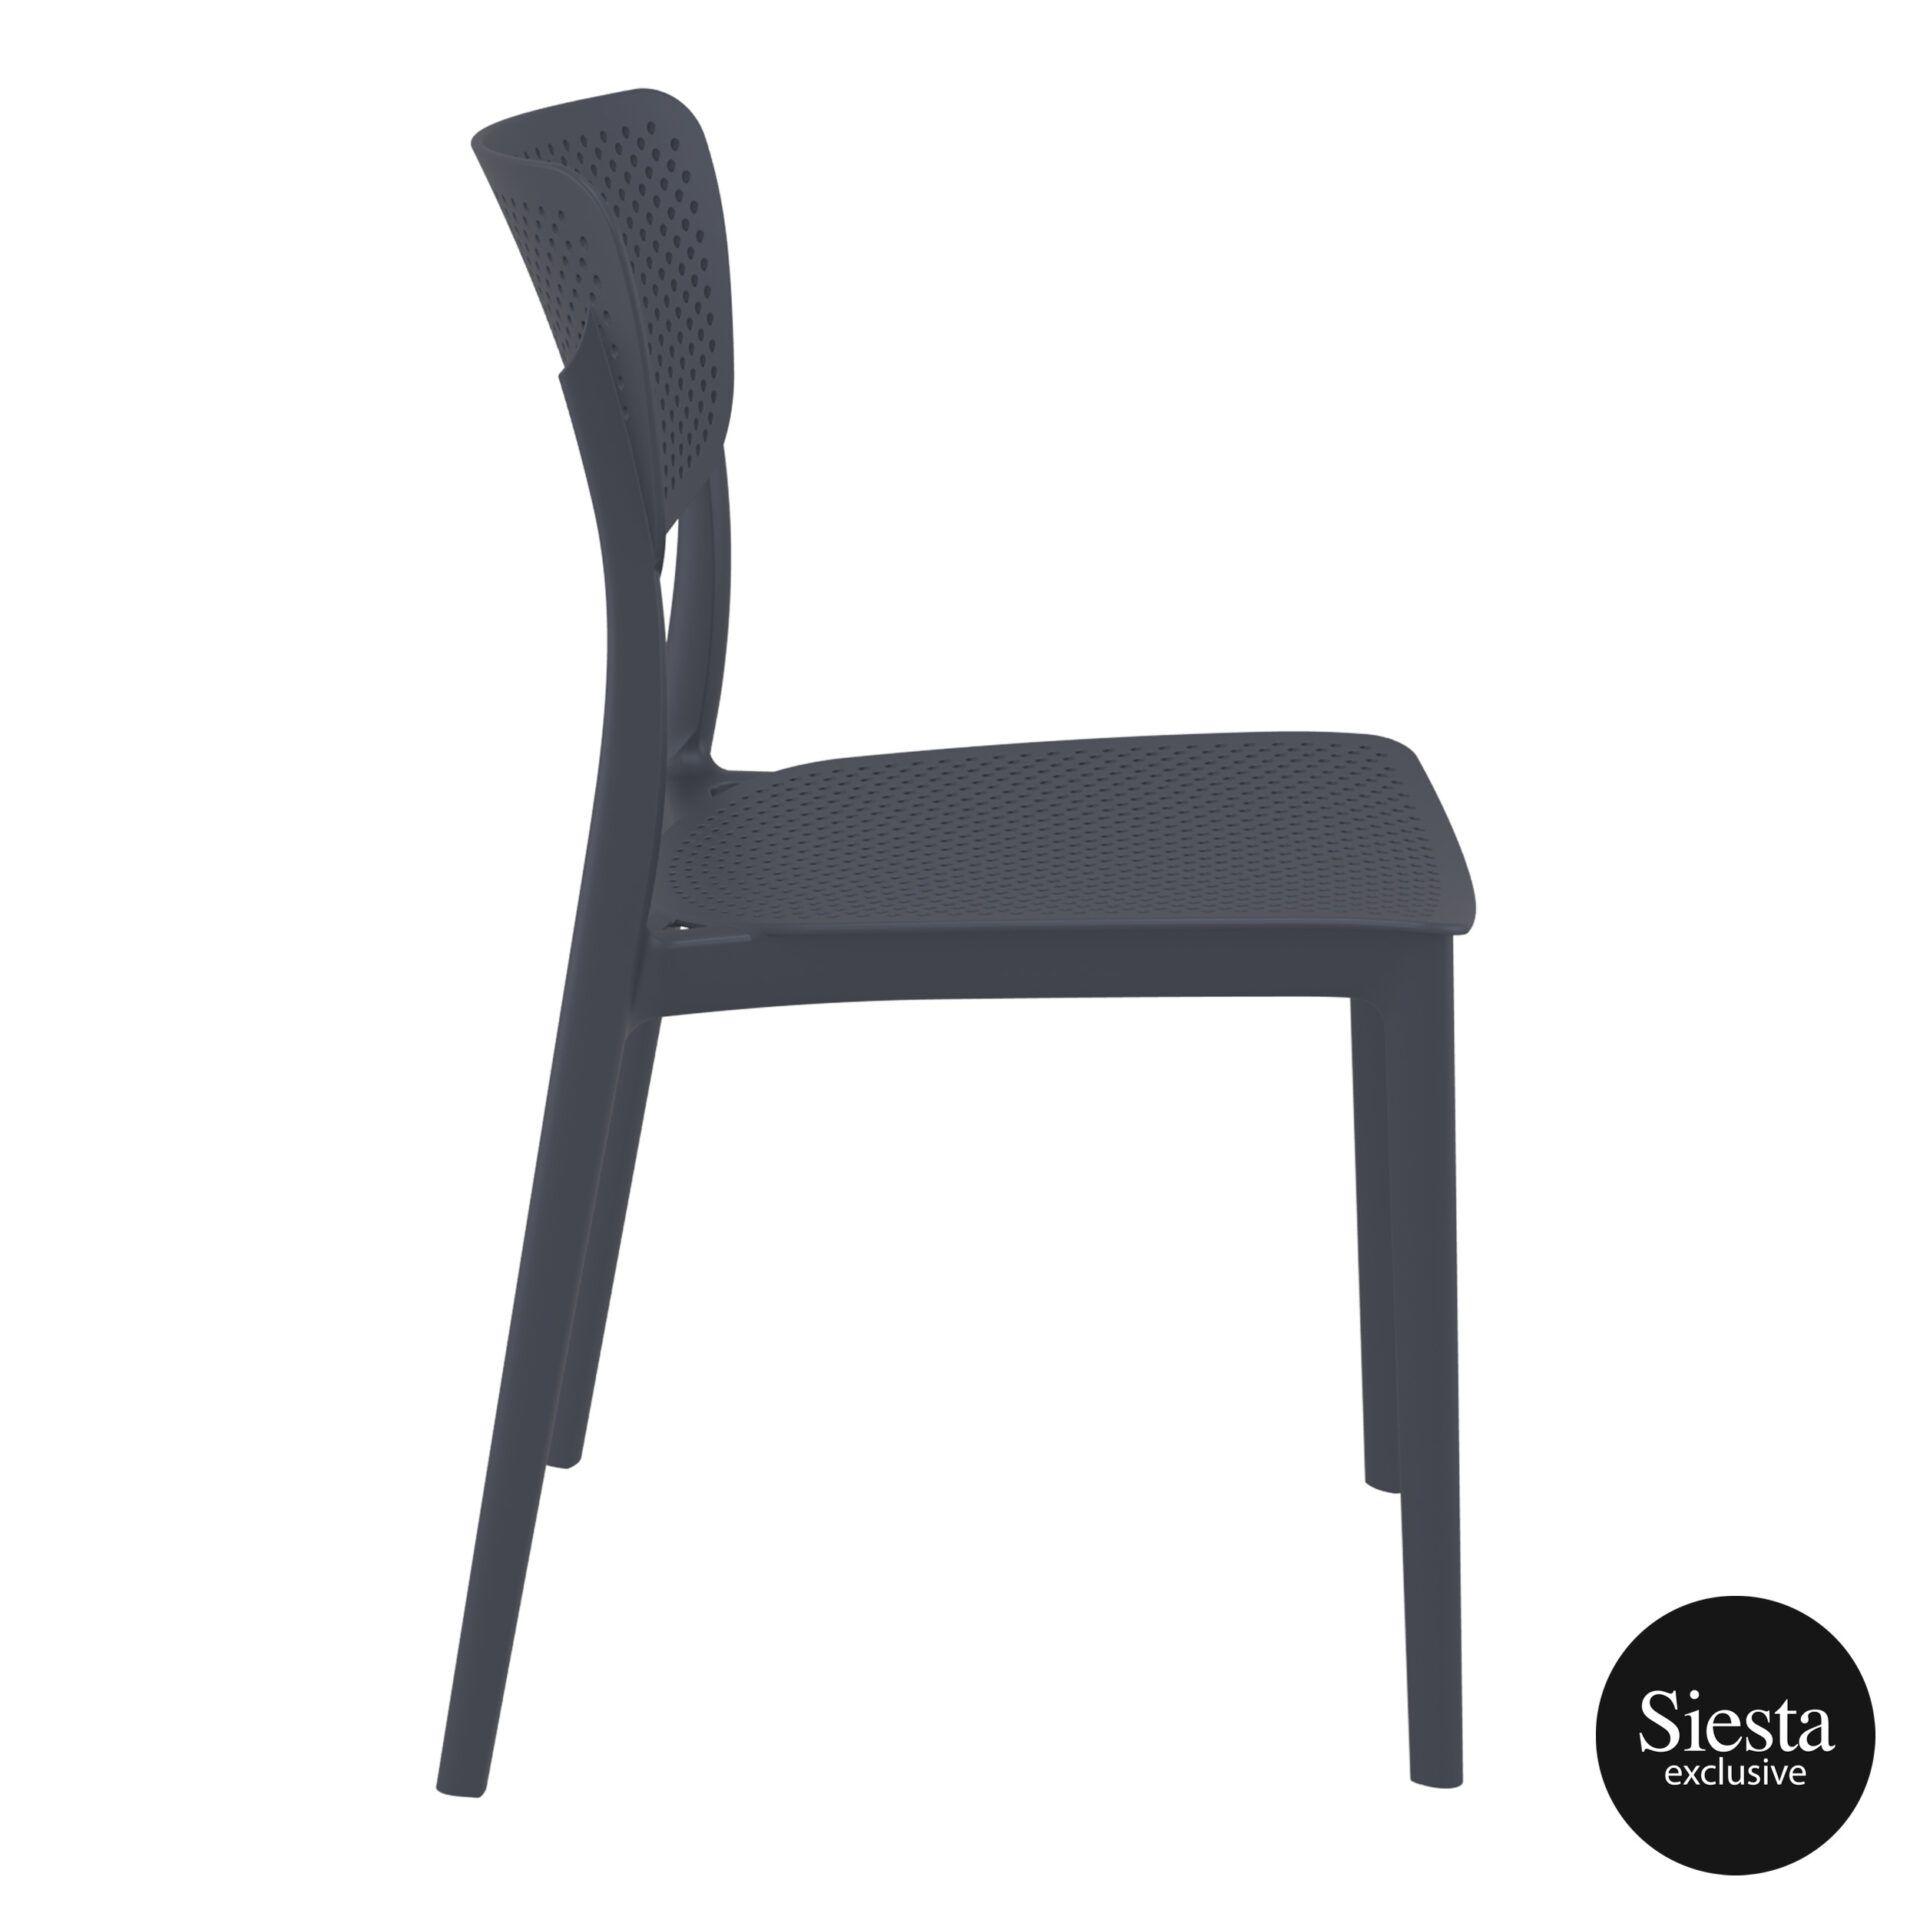 polypropylene hospitality seating lucy chair darkgrey side 2